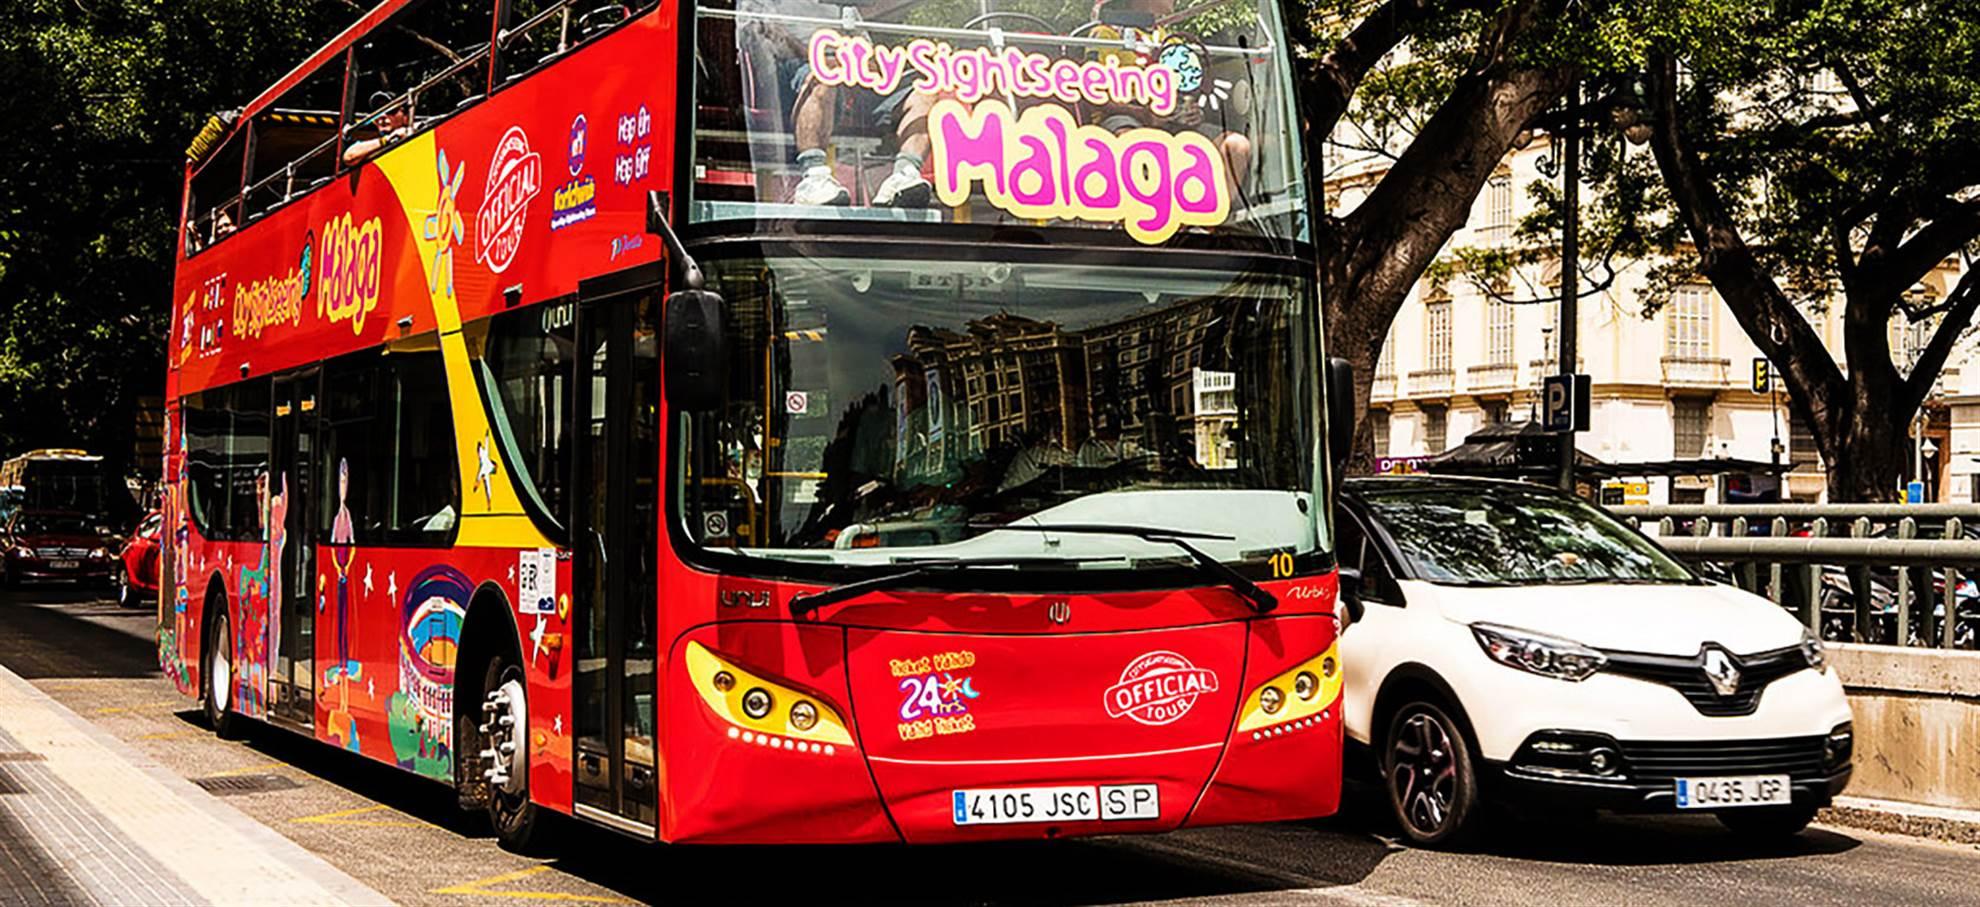 Ônibus Hop on Hop off em Malaga